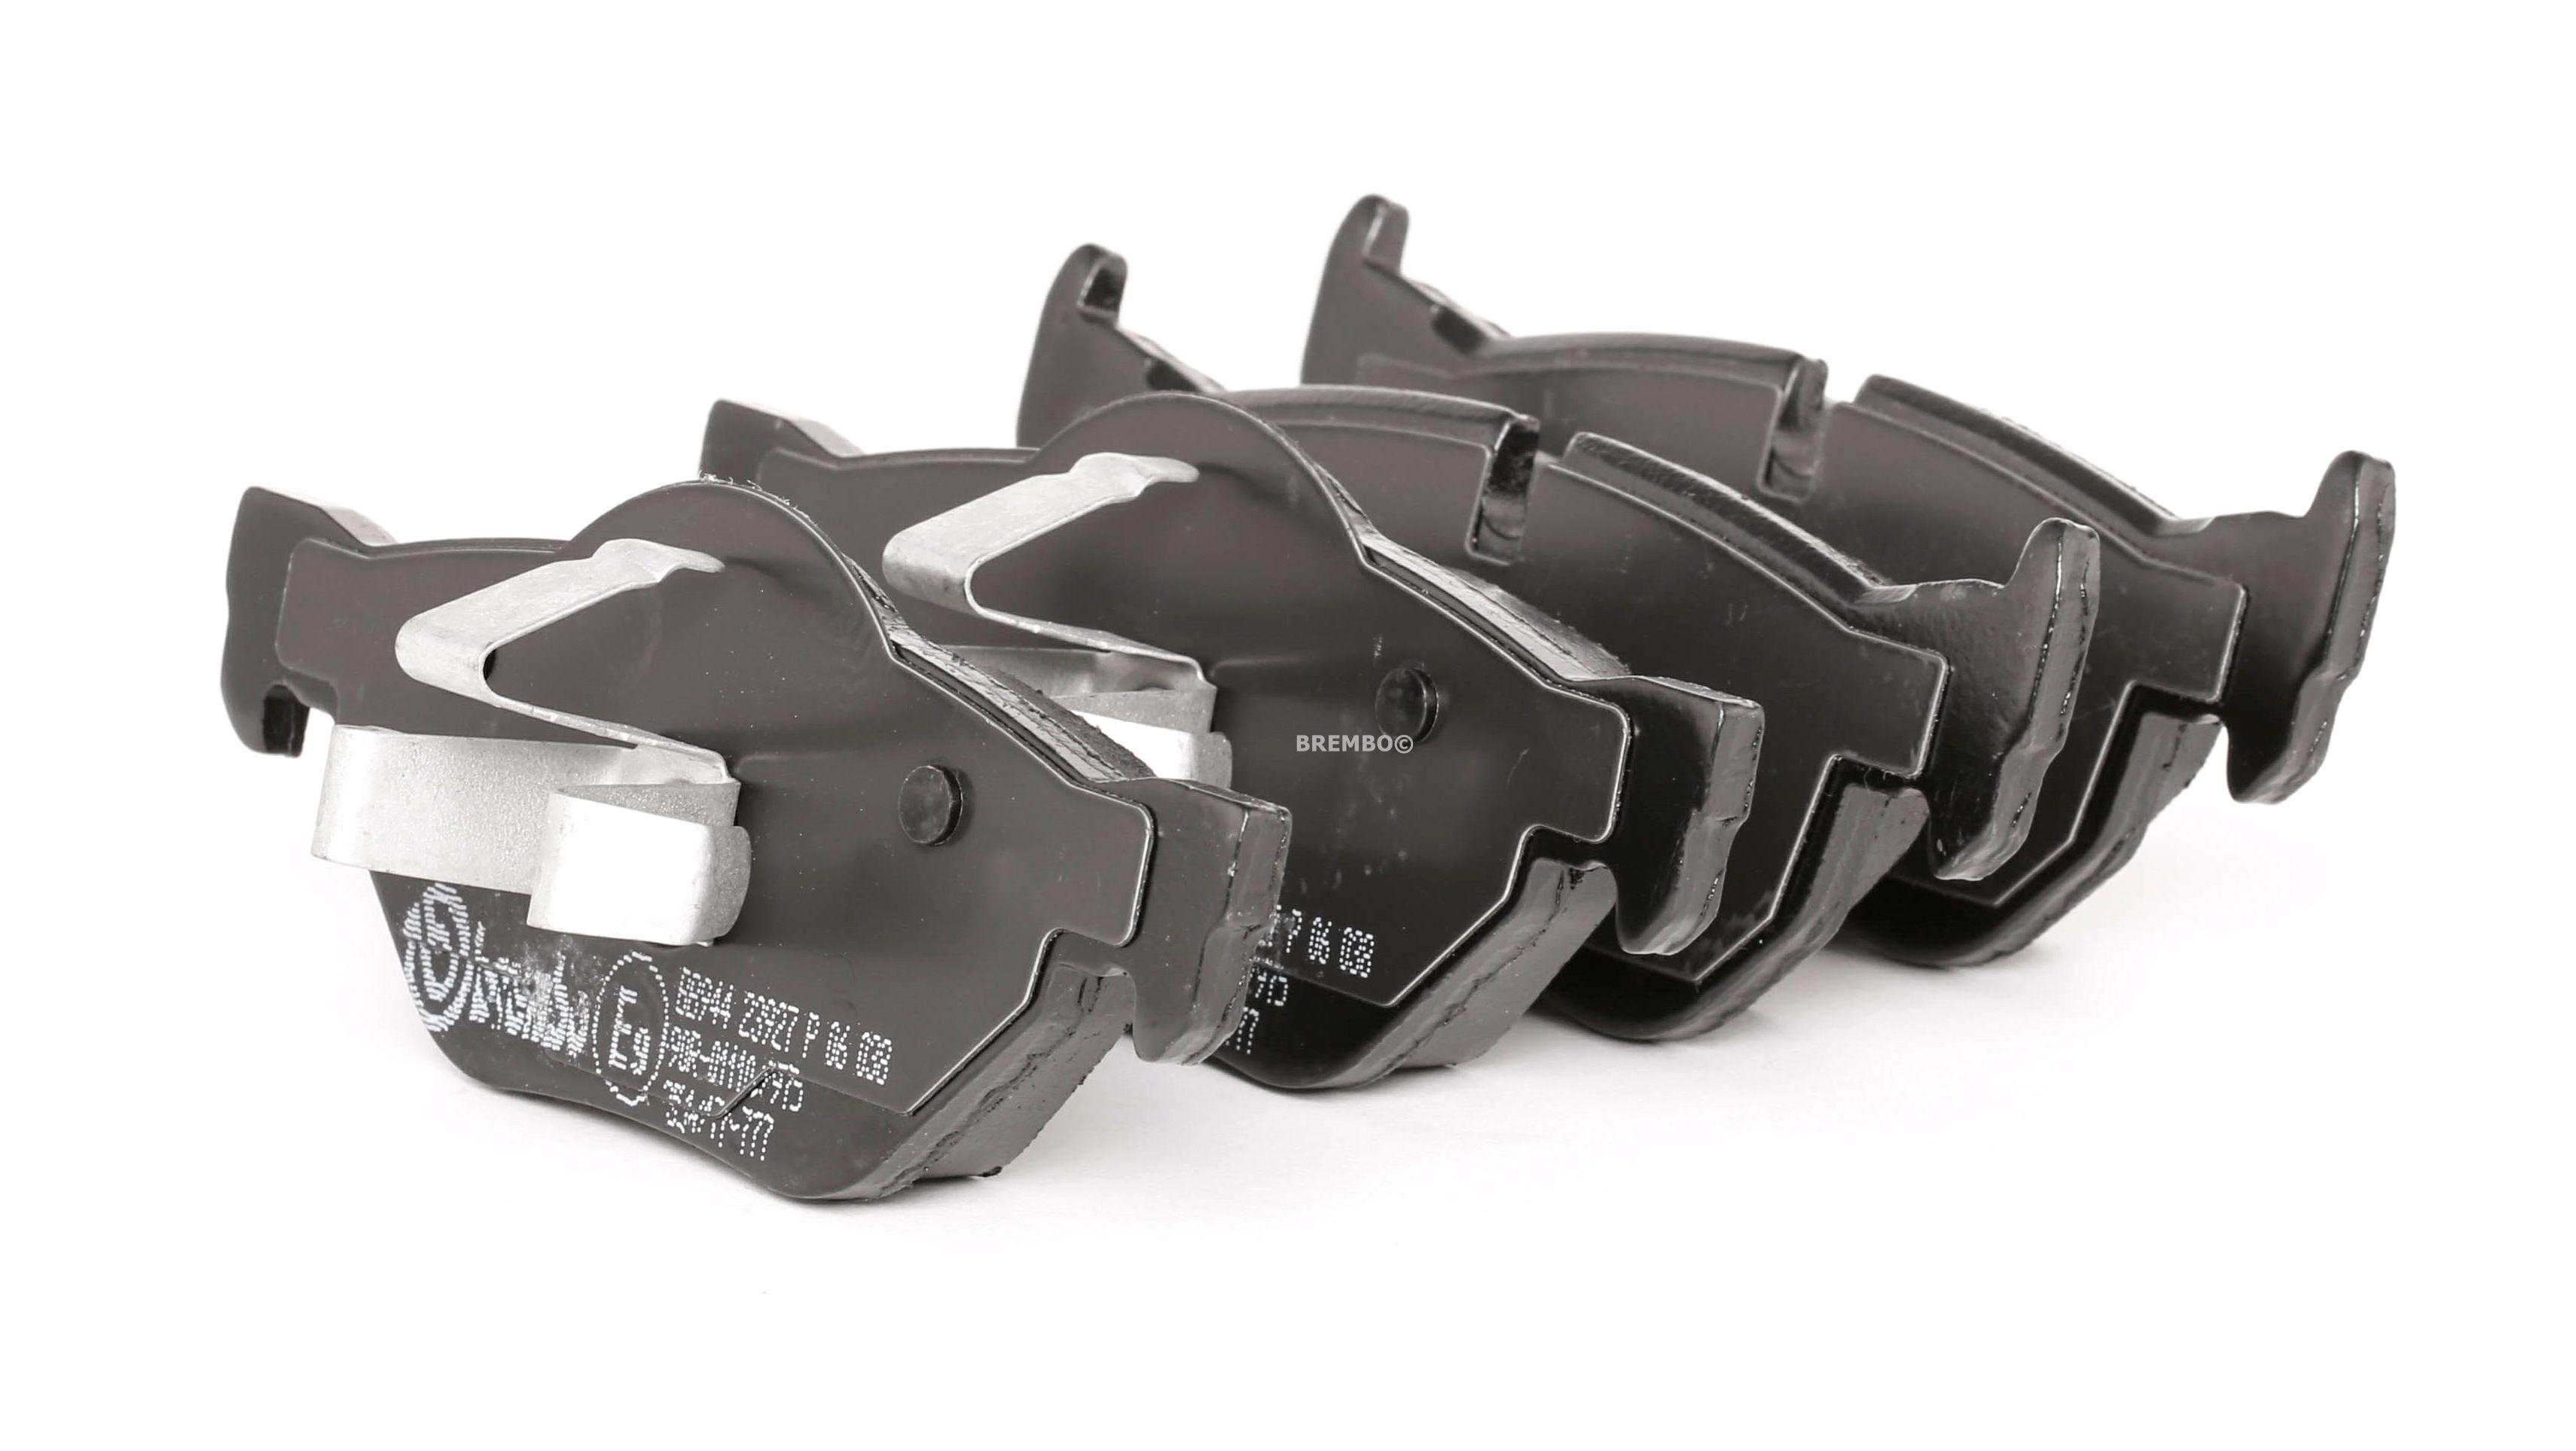 Disk brake pads BREMBO D12677286 rating